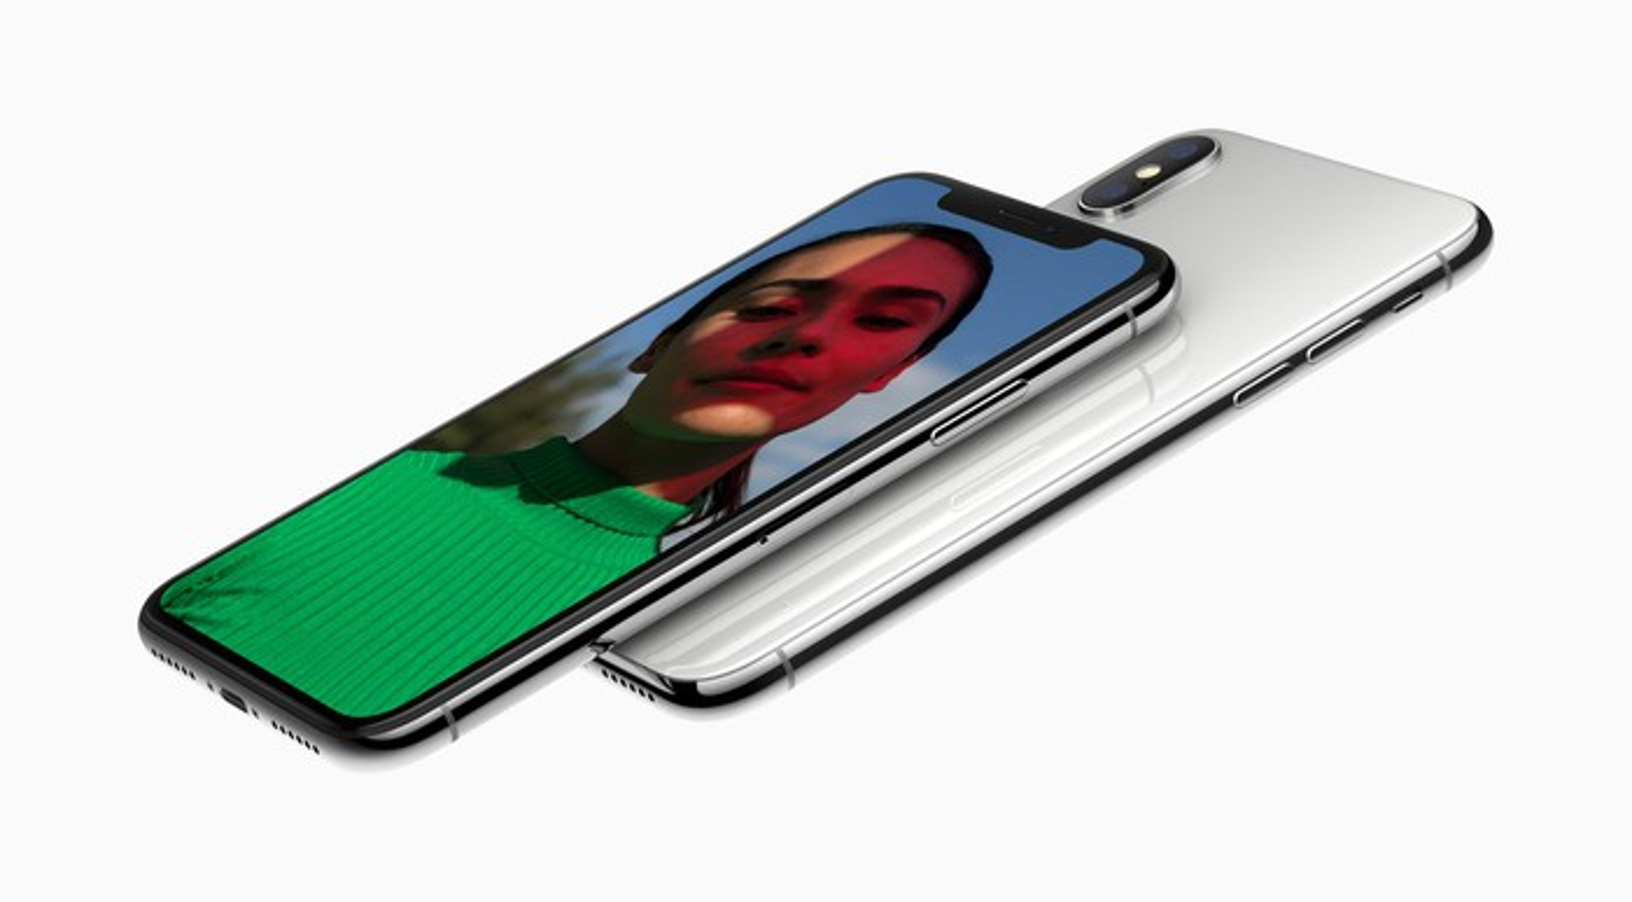 An iPhone X